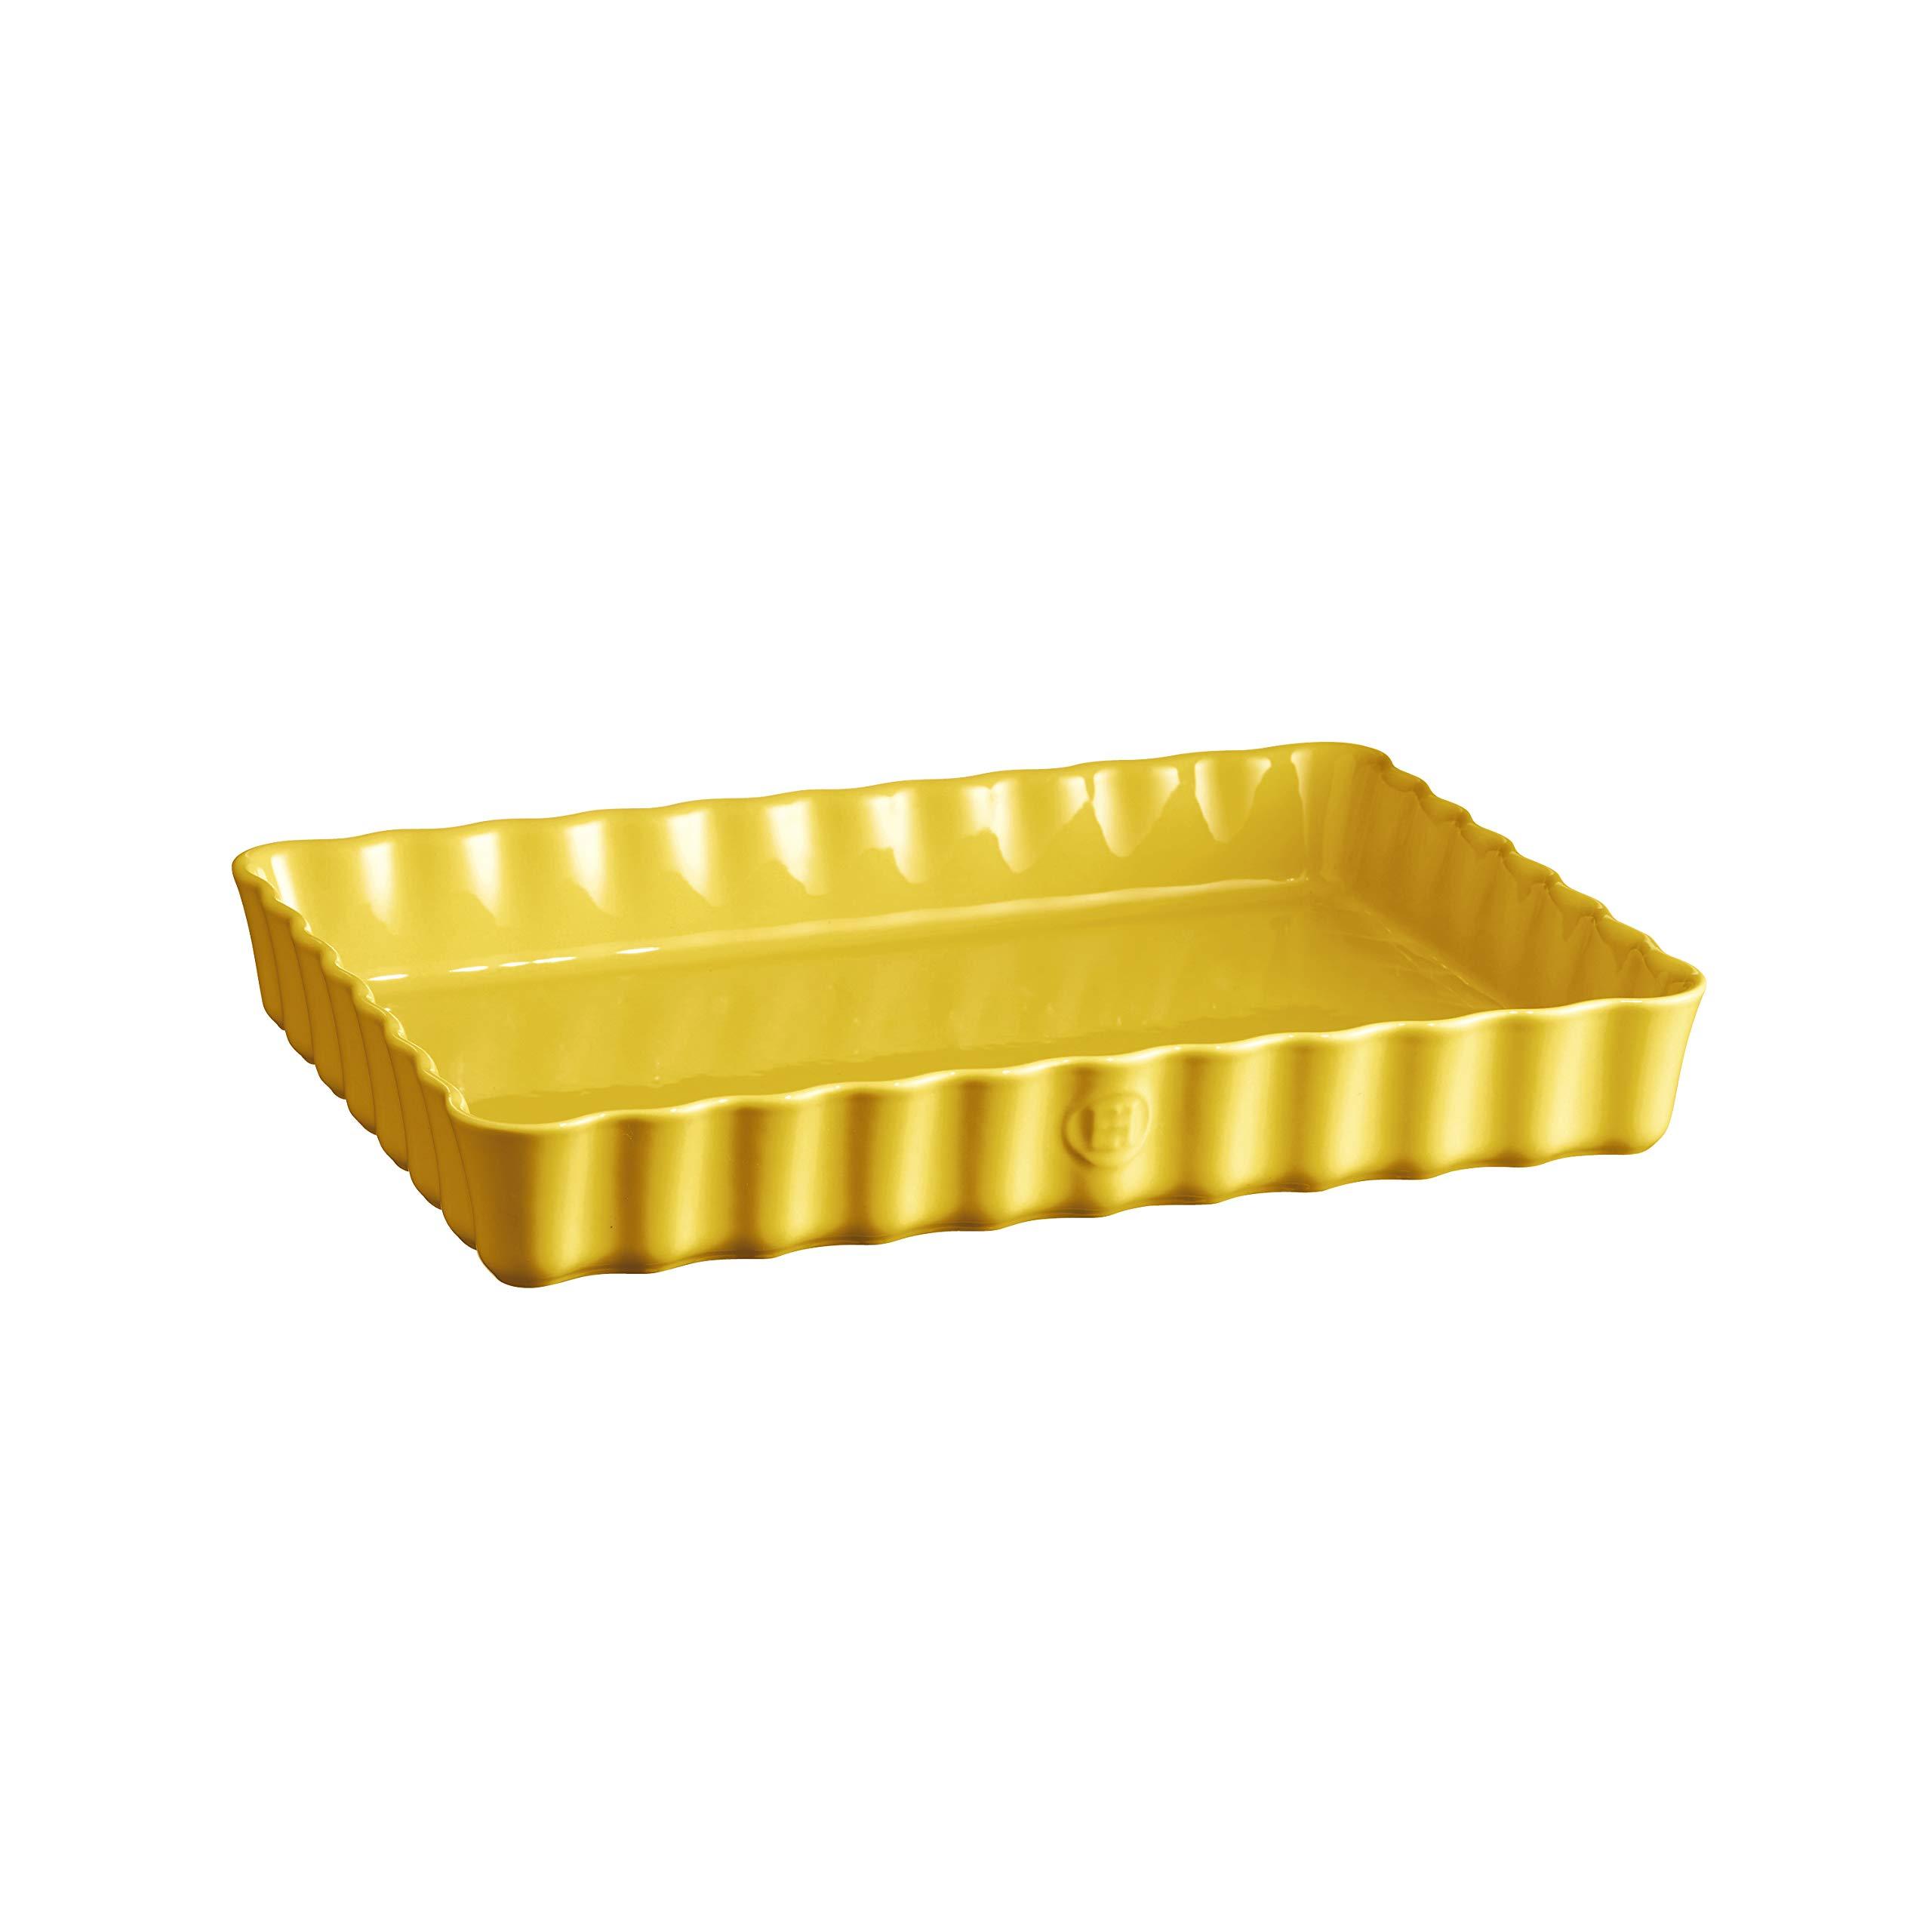 Emile Henry 906038 Large, Provence Yellow Rectangular Tart Dish, 2.5 qt,